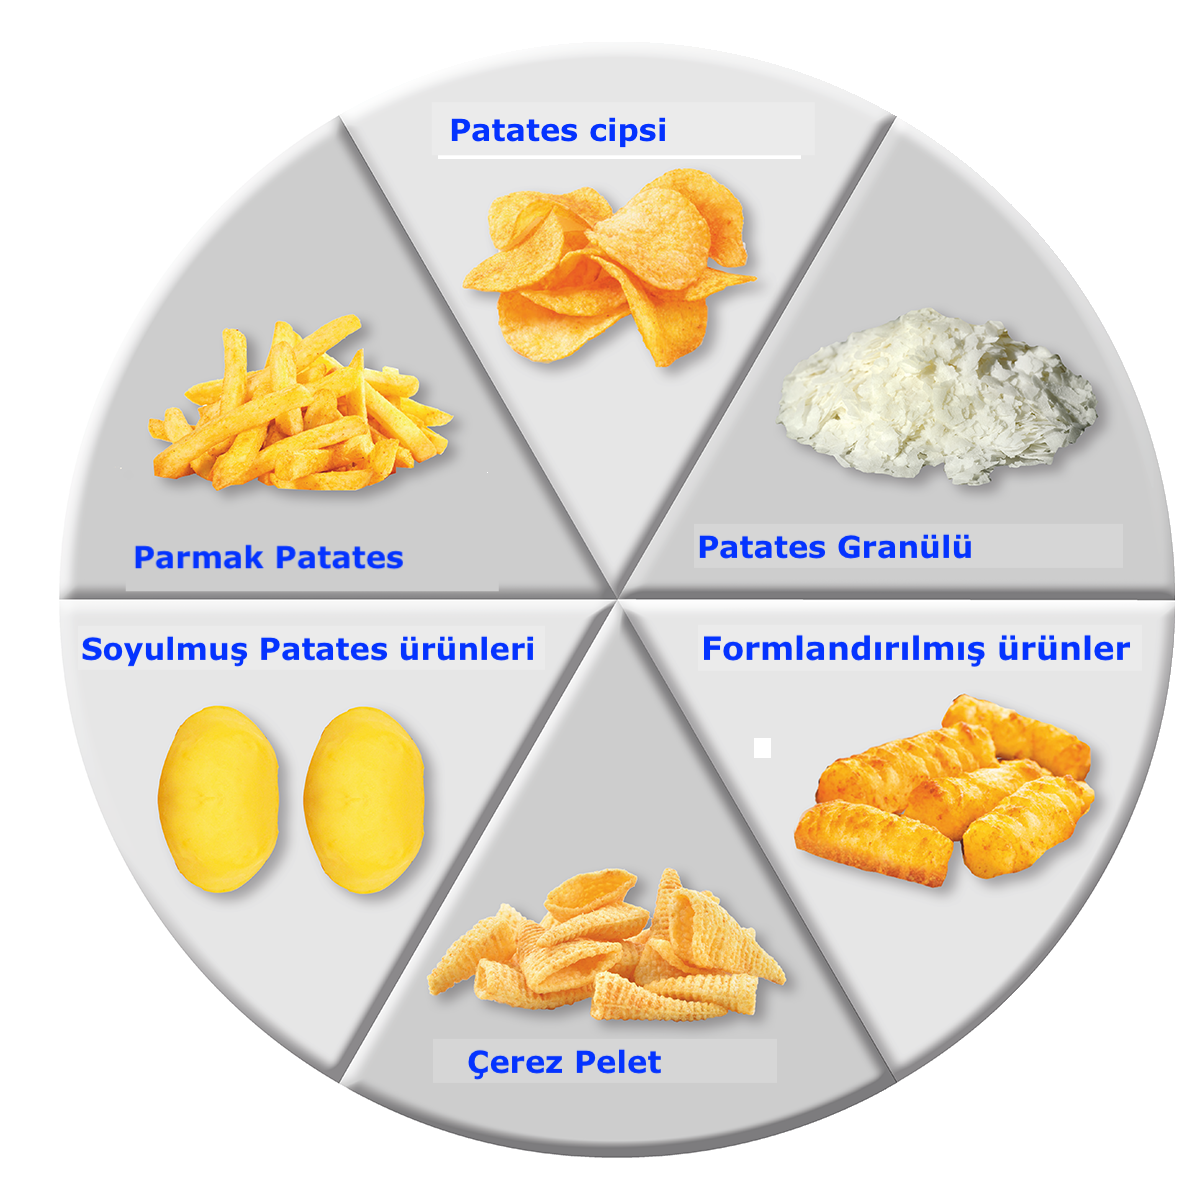 Patates Proses makineleri